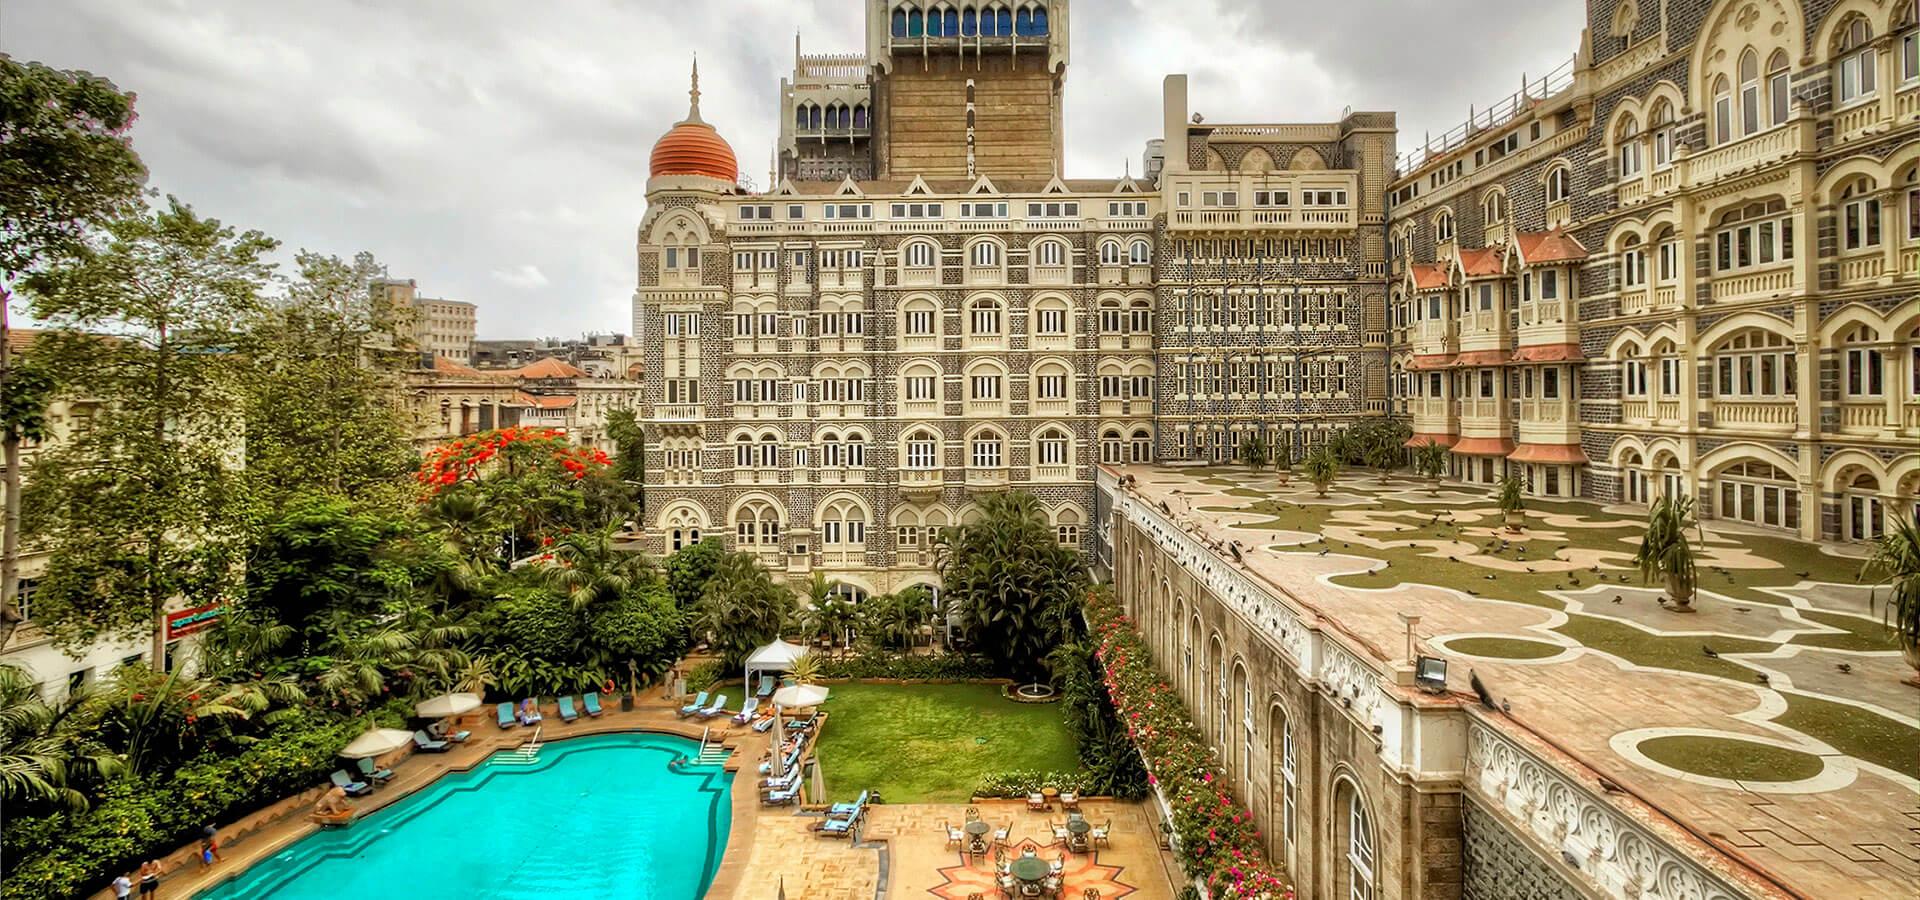 Мумбай Индия